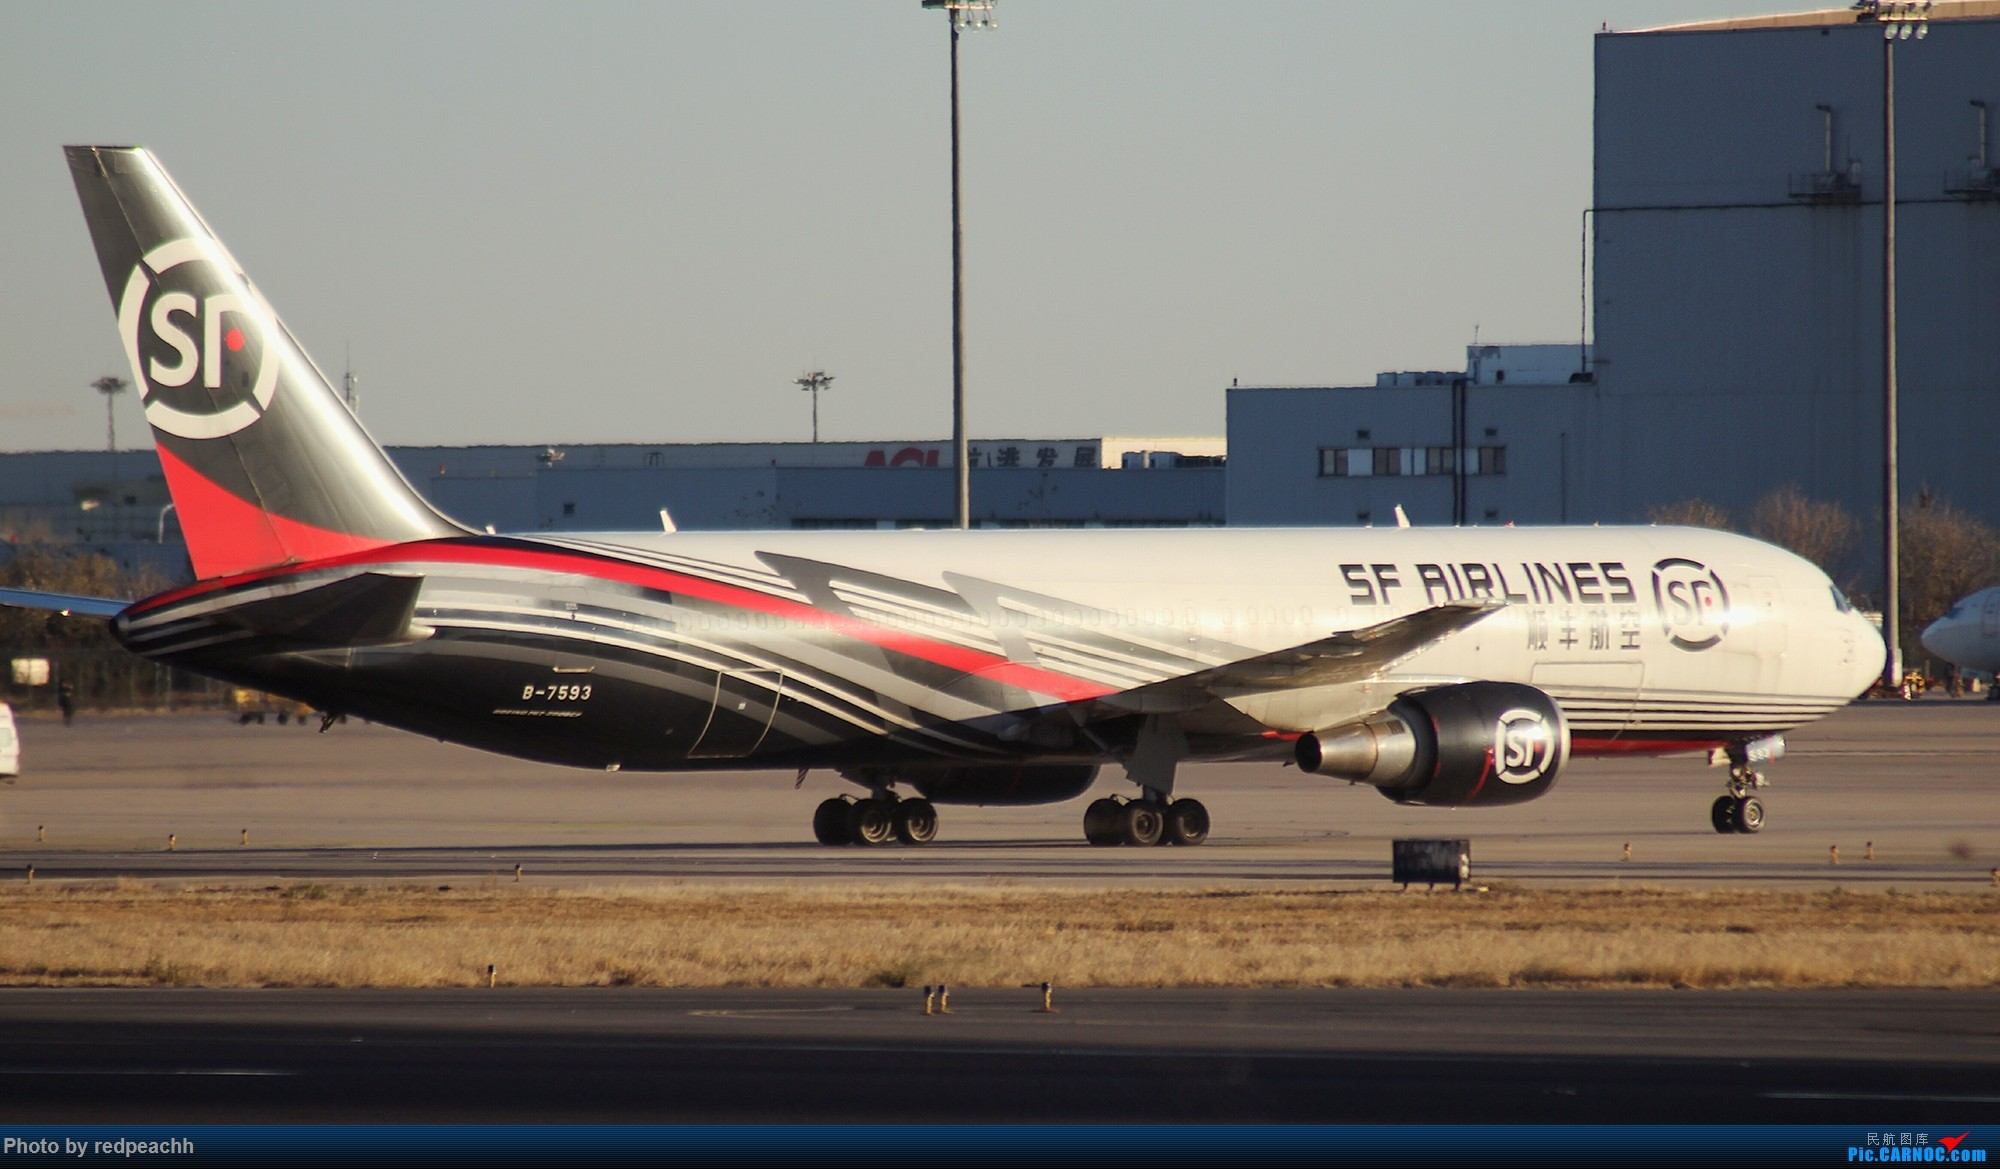 Re:[原创]河北人为拍机而首都机场2日游虽常规但值得纪念(36L) BOEING 767-300ER B-7593 中国北京首都国际机场